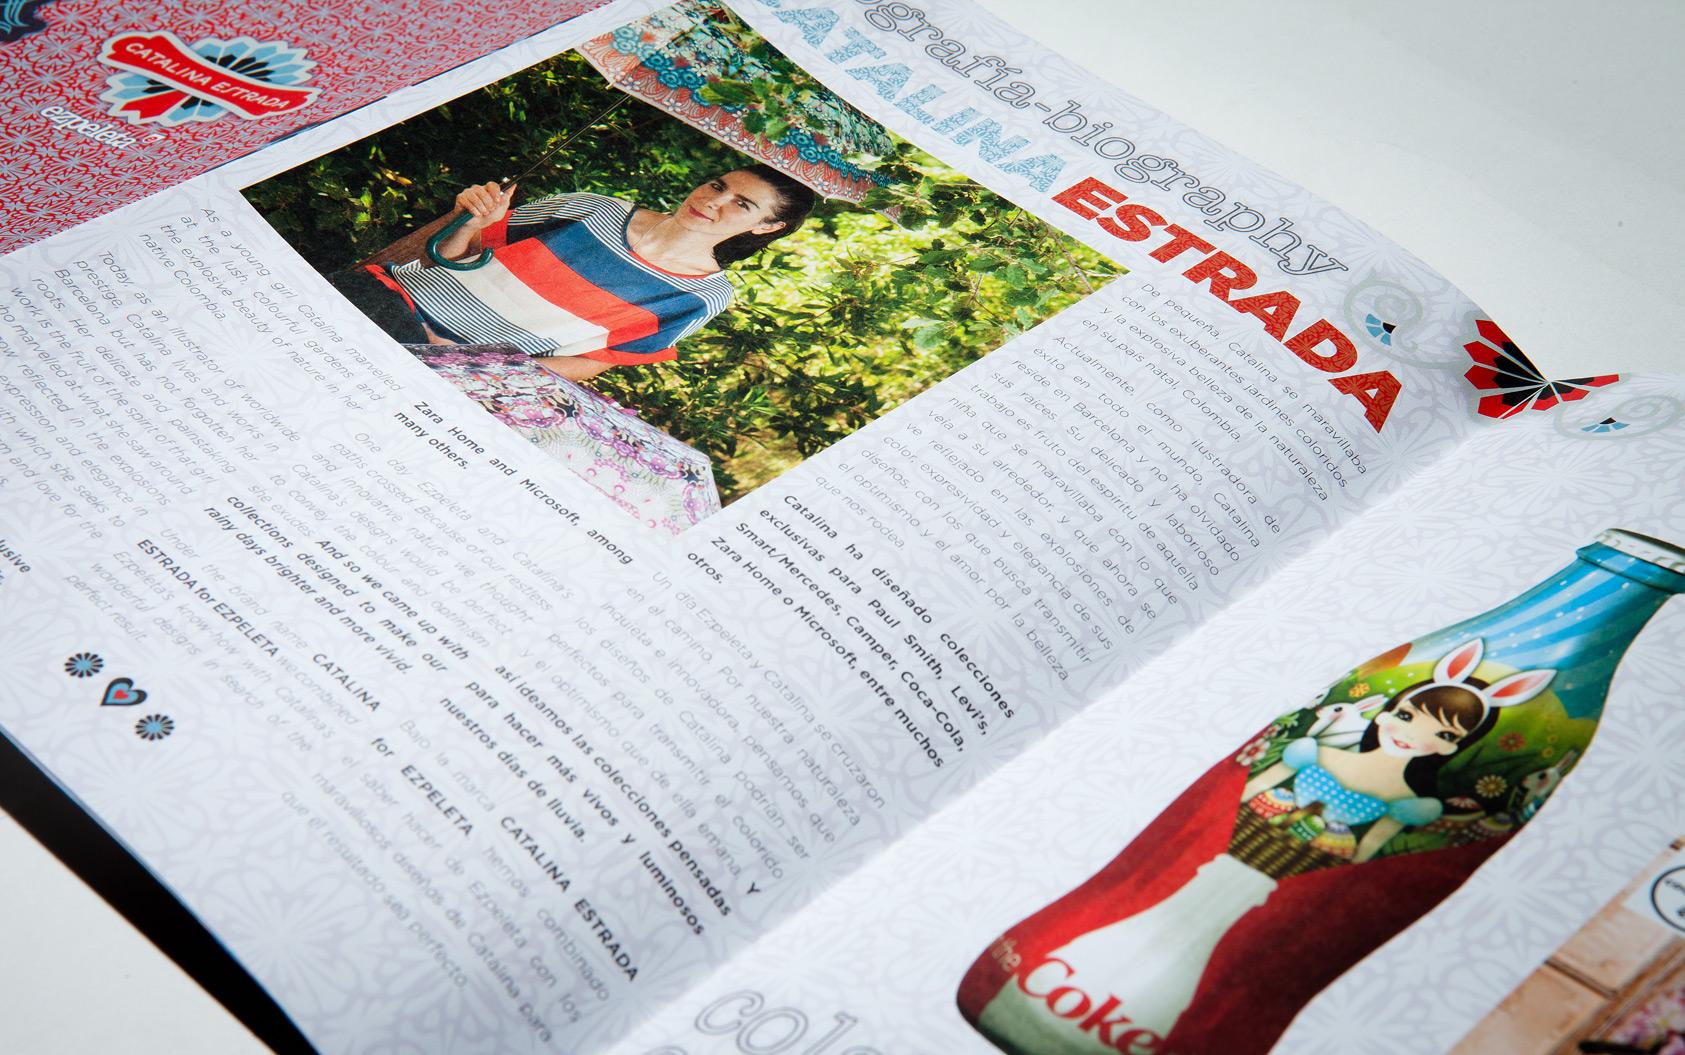 lombok_design_marketing_blog_ezpeleta_catalogos_2